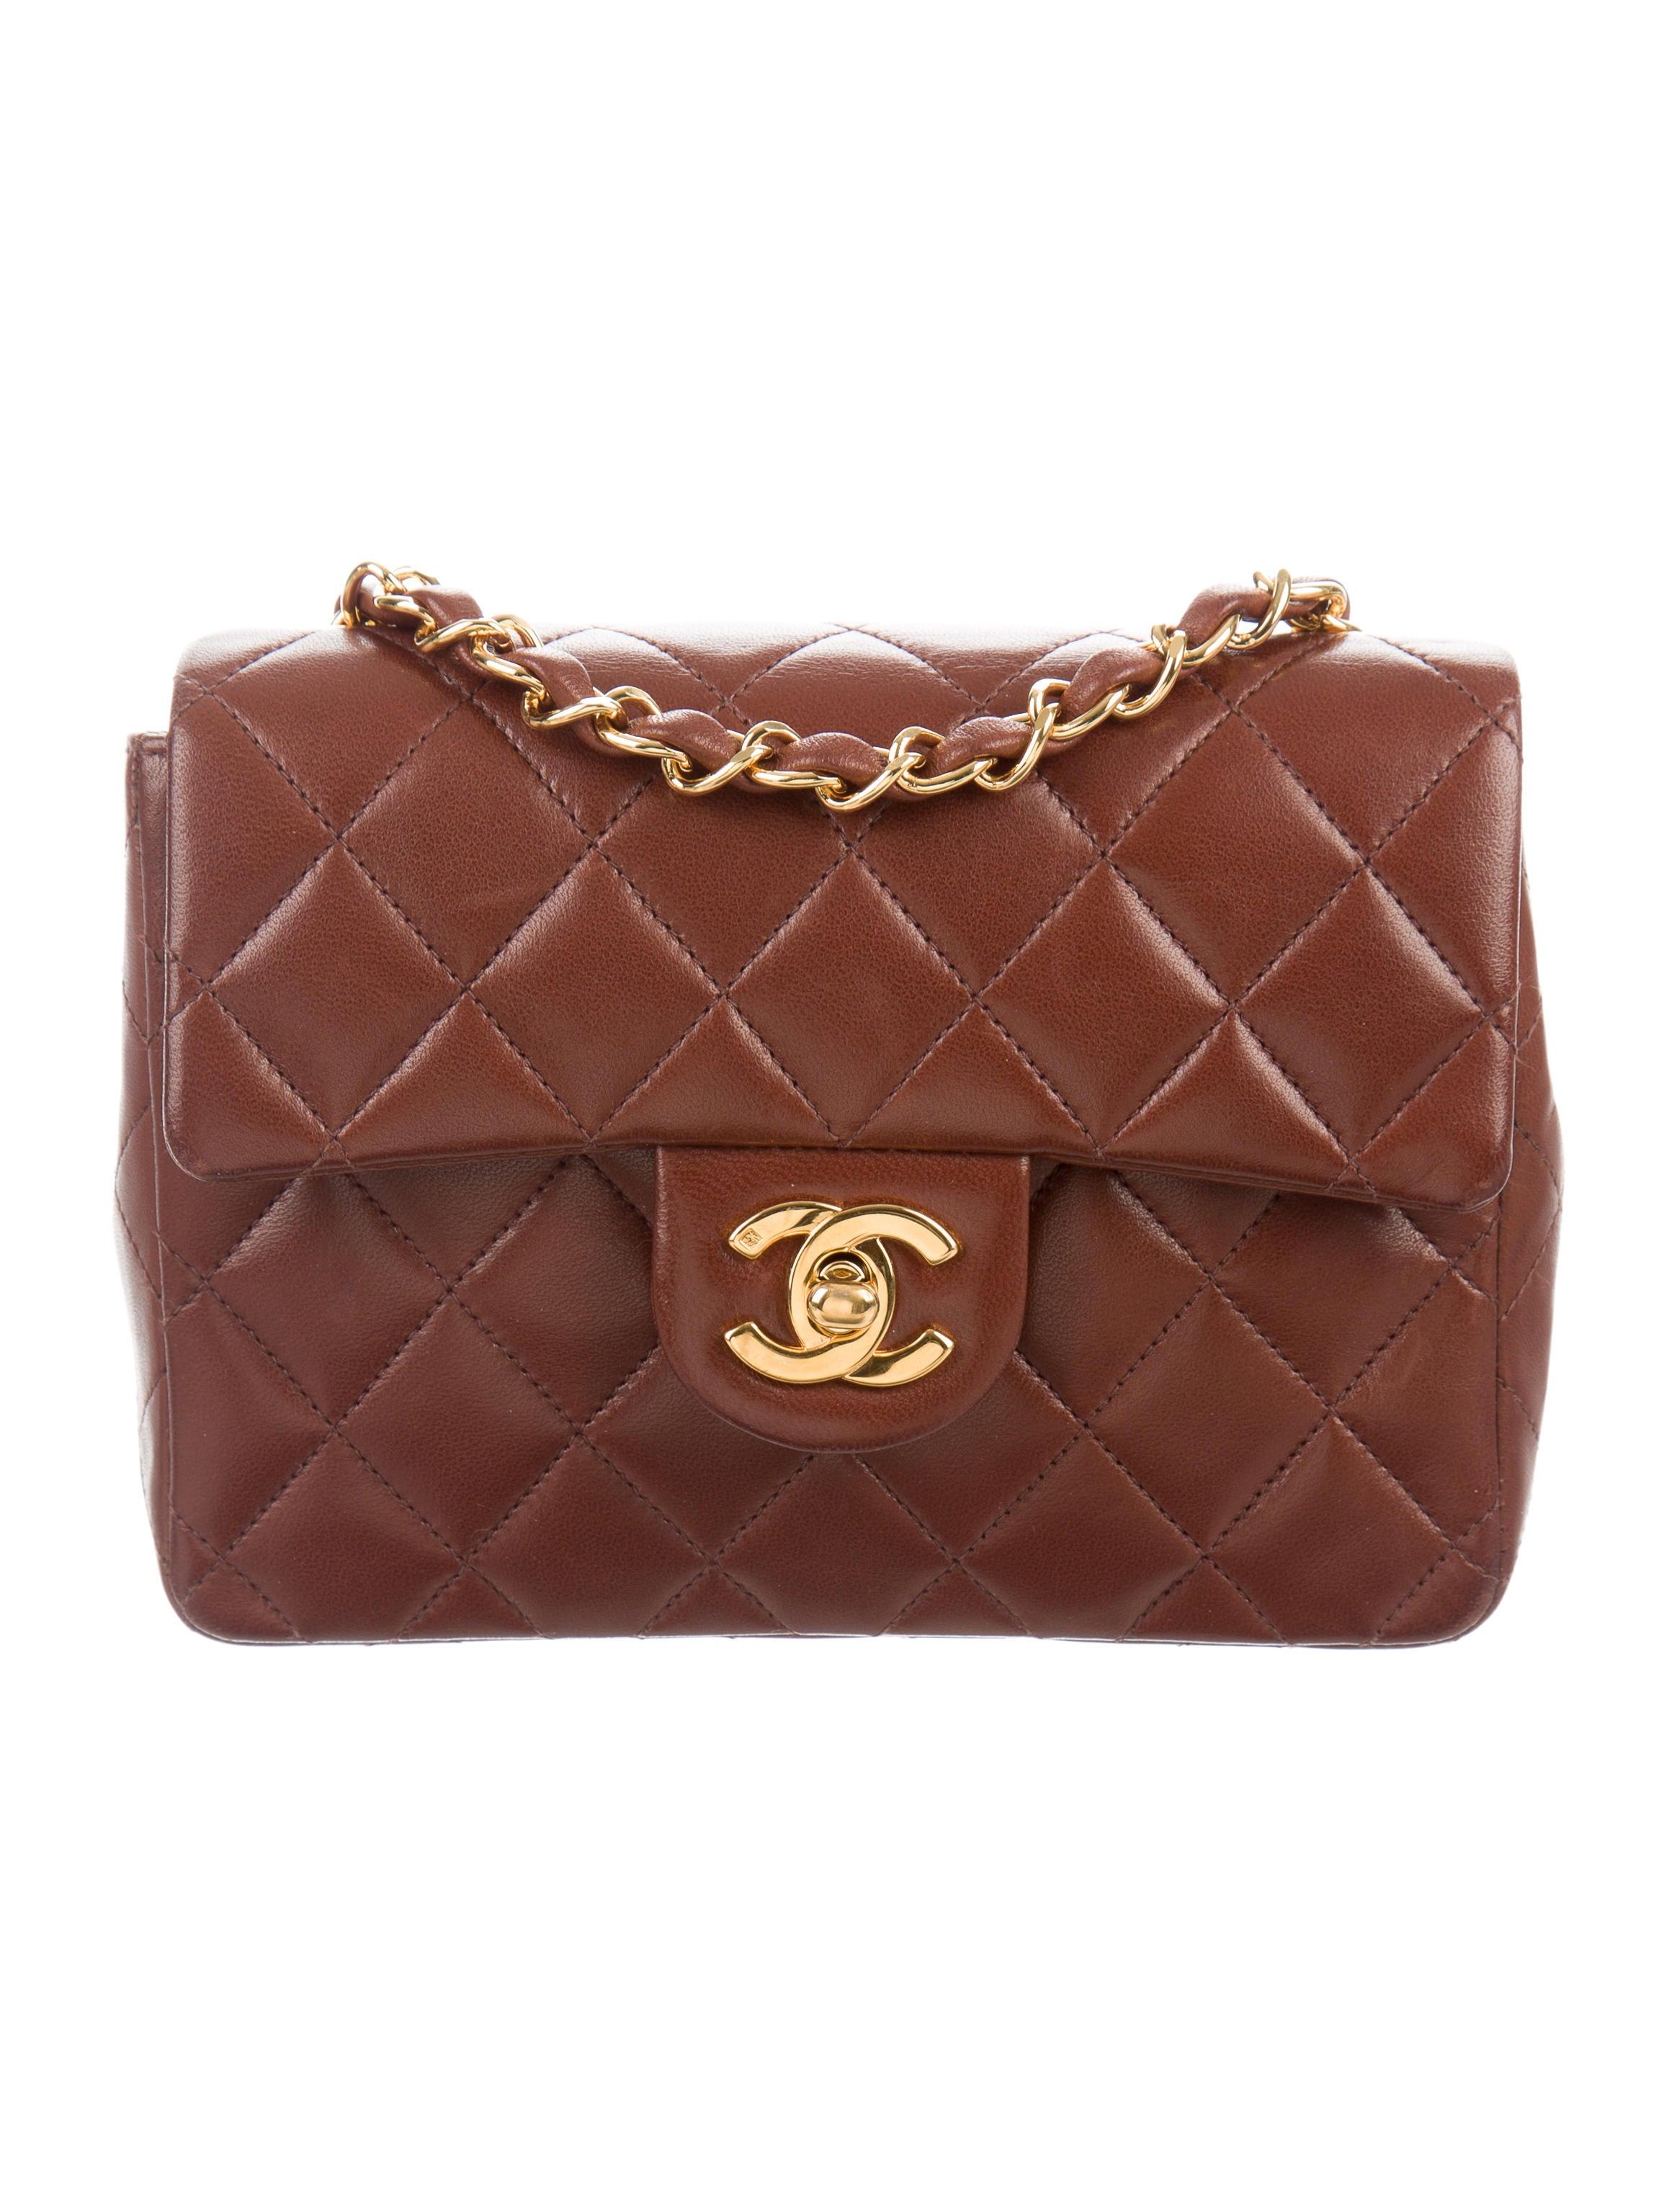 Chanel Väskor Vintage : Chanel vintage classic mini square flap bag handbags